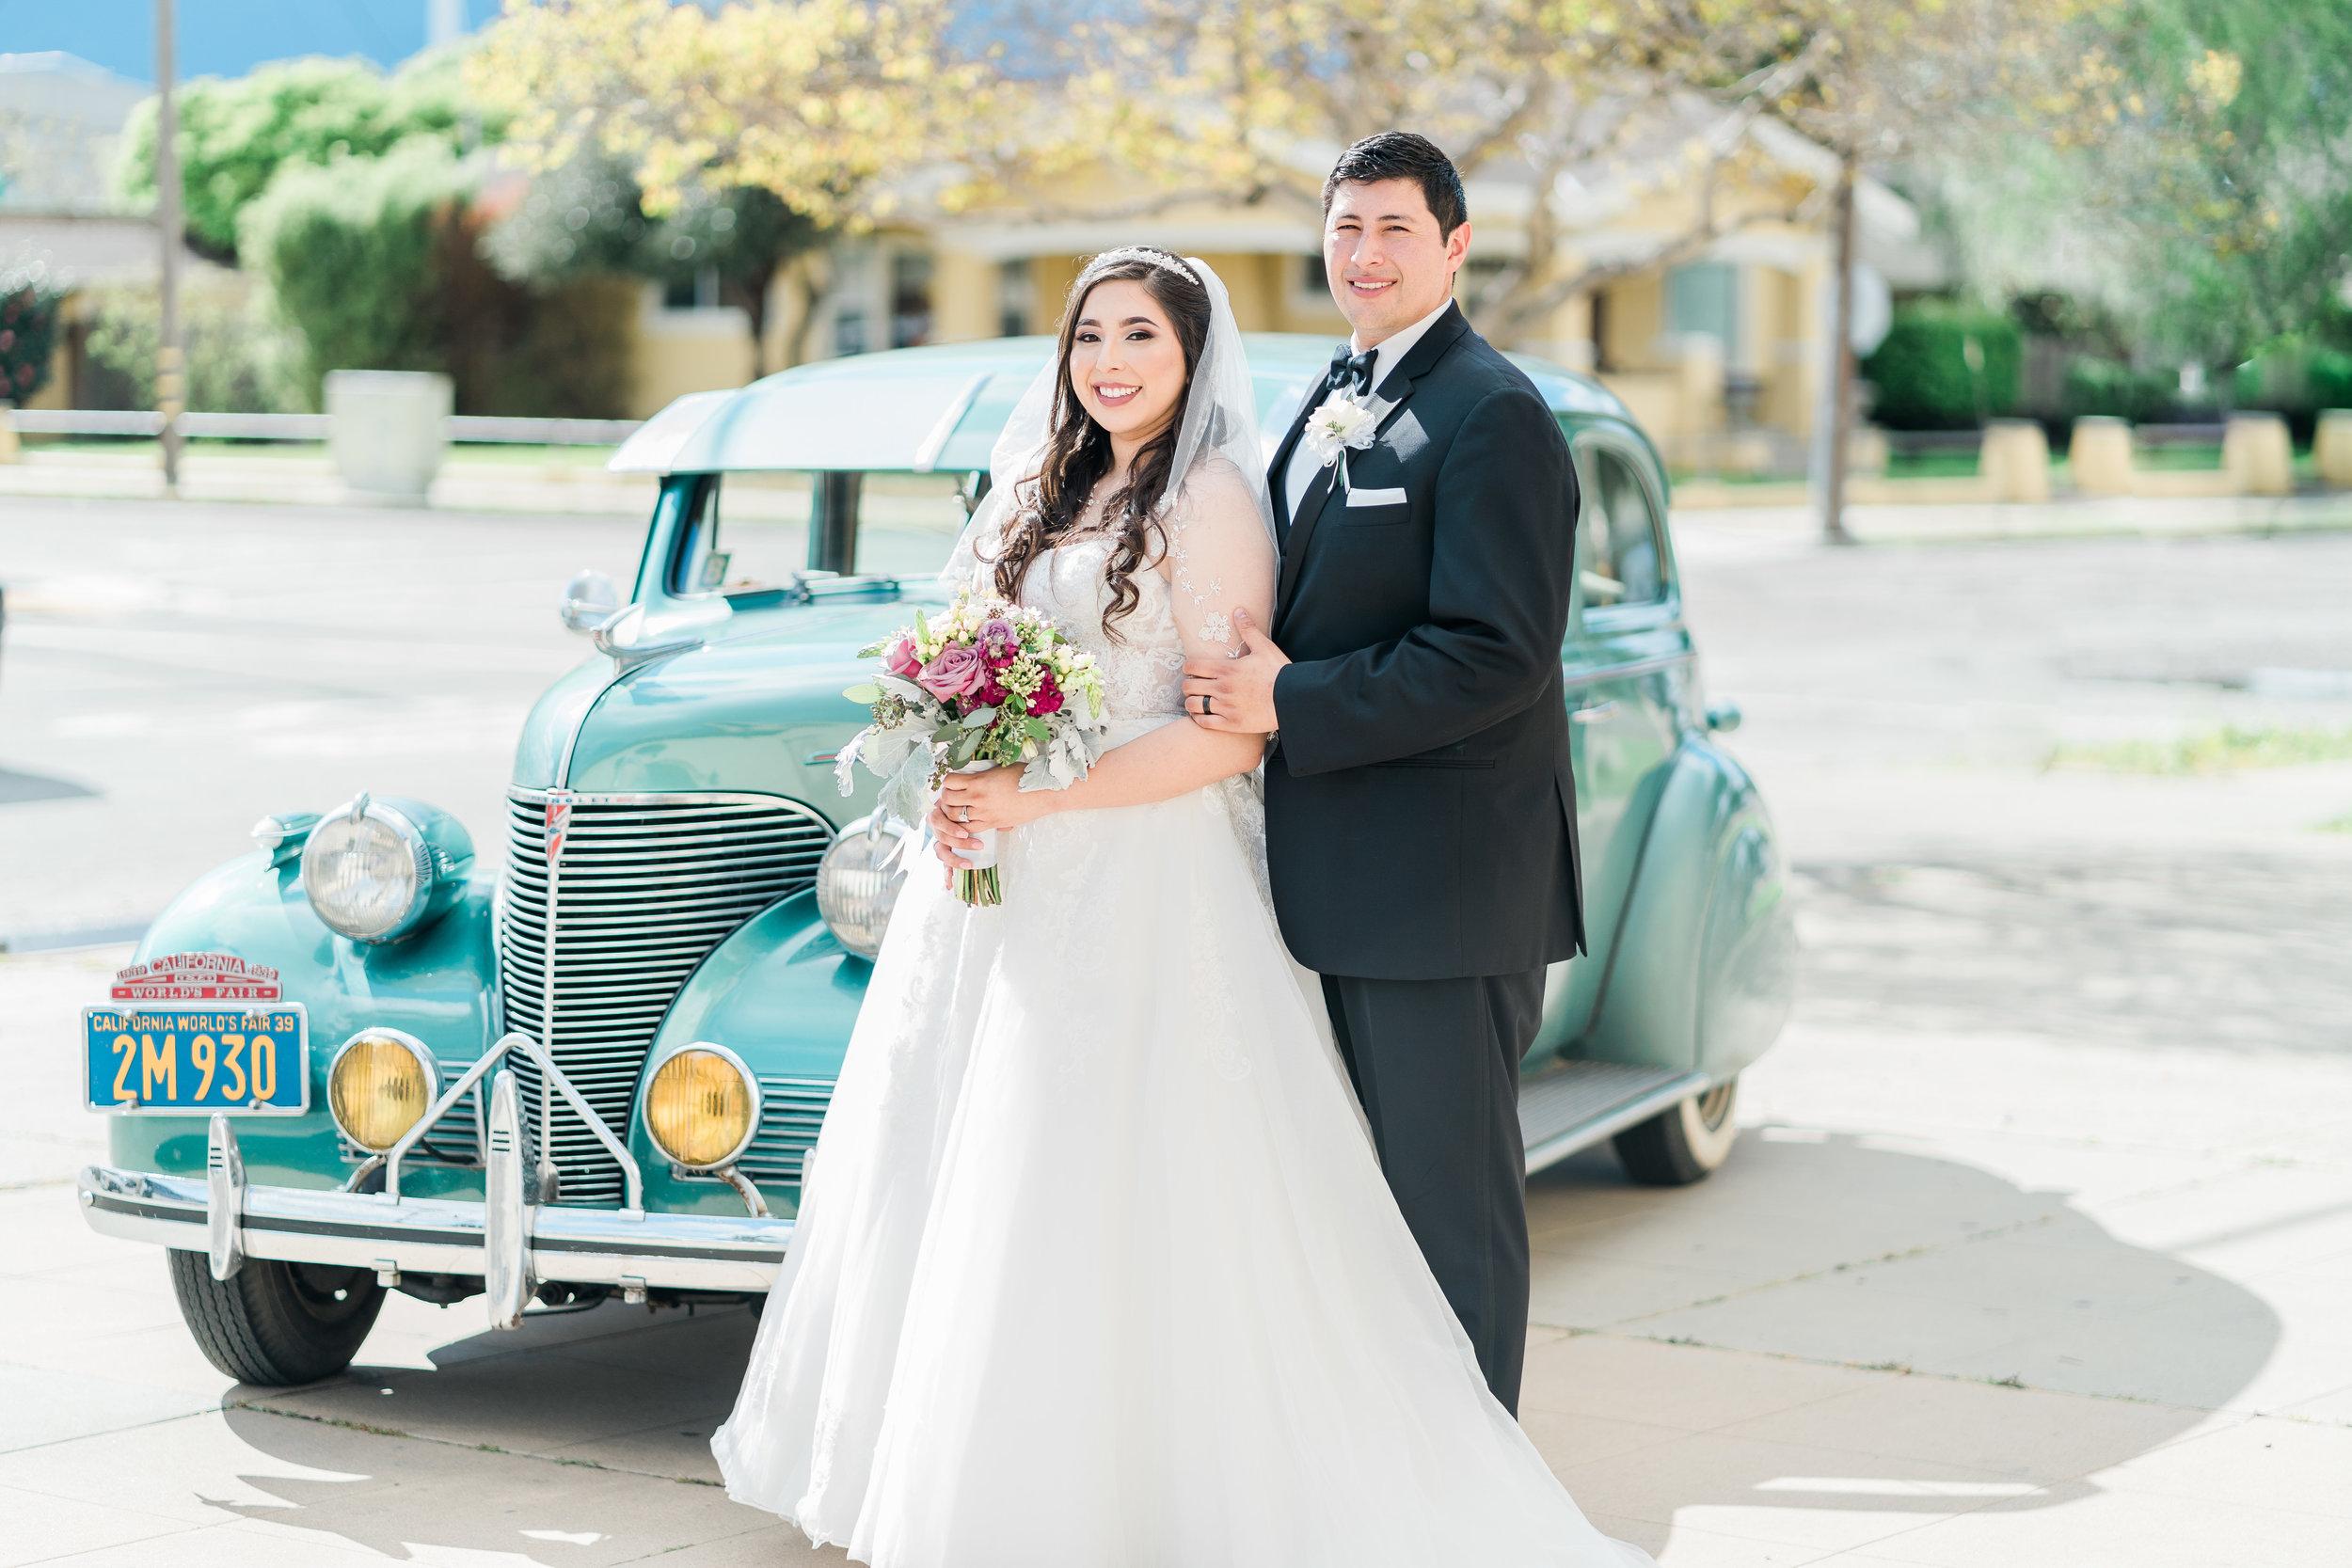 naval-postgraduate-school-wedding-in-monterey-ca-drew-zavala-photo-justin+janelle-4.jpg